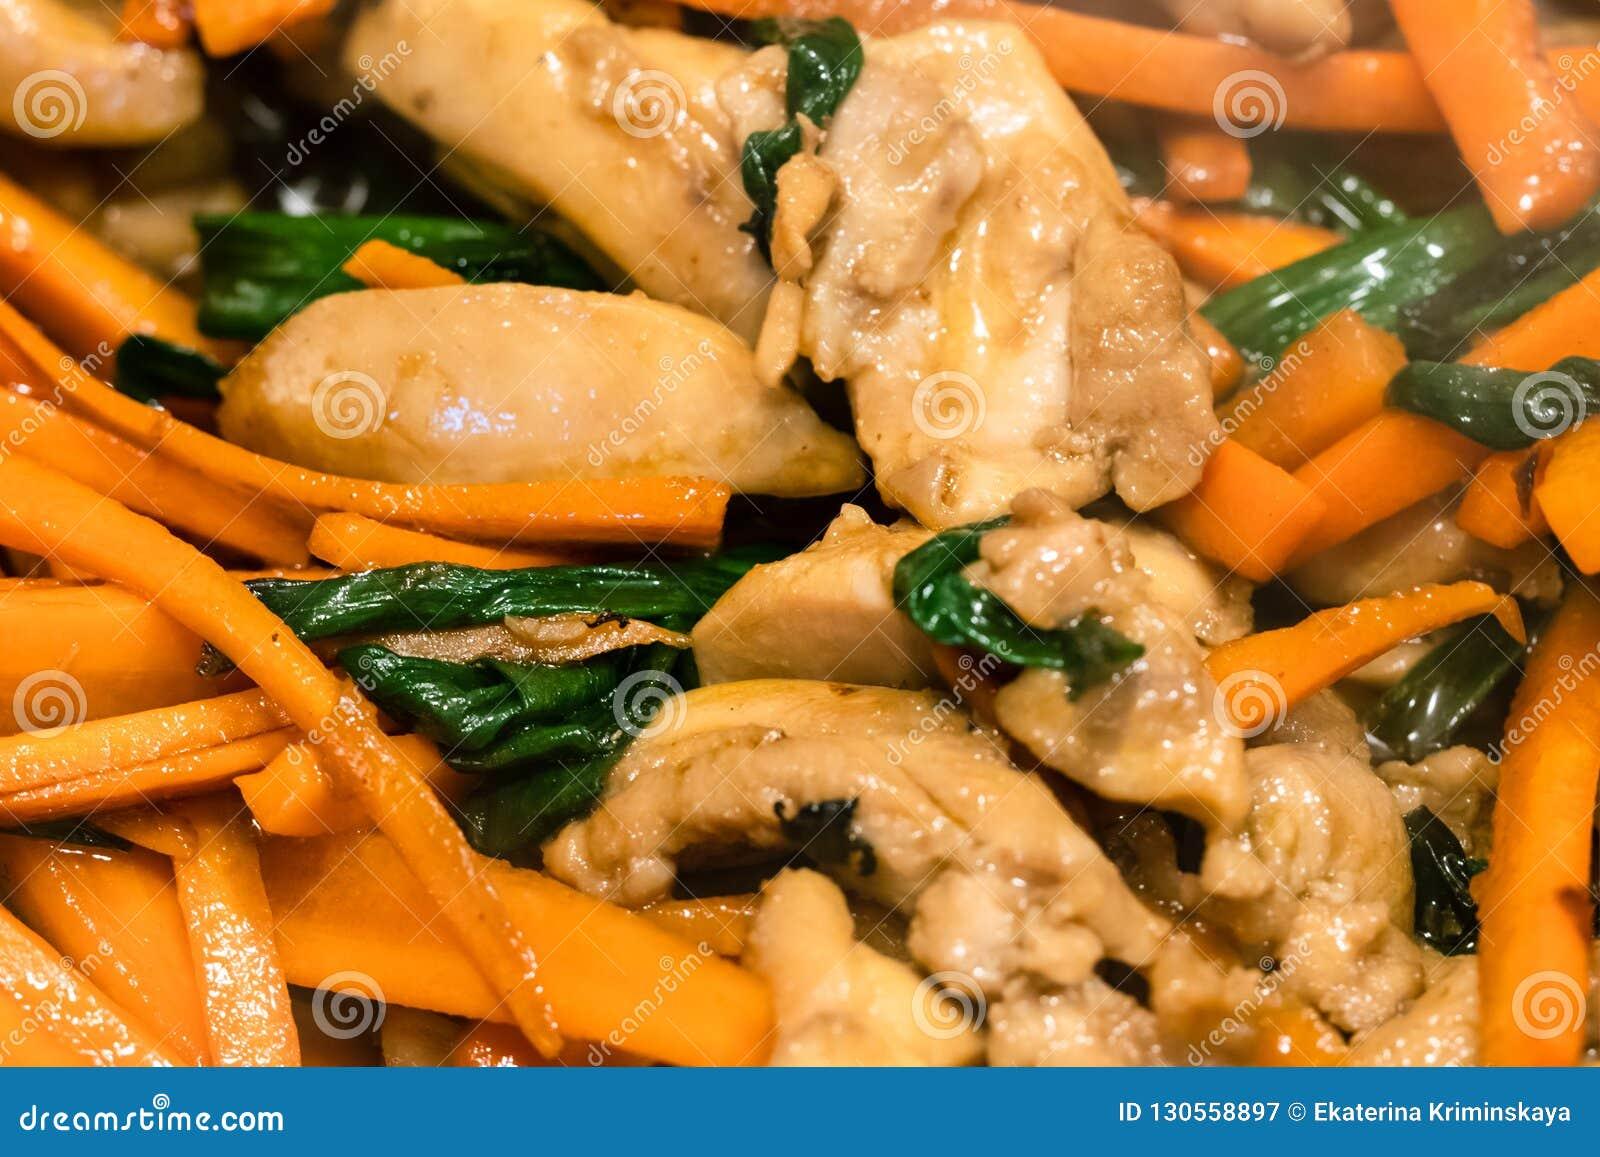 Pedazos de carne del pollo que fríen con las zanahorias cortadas